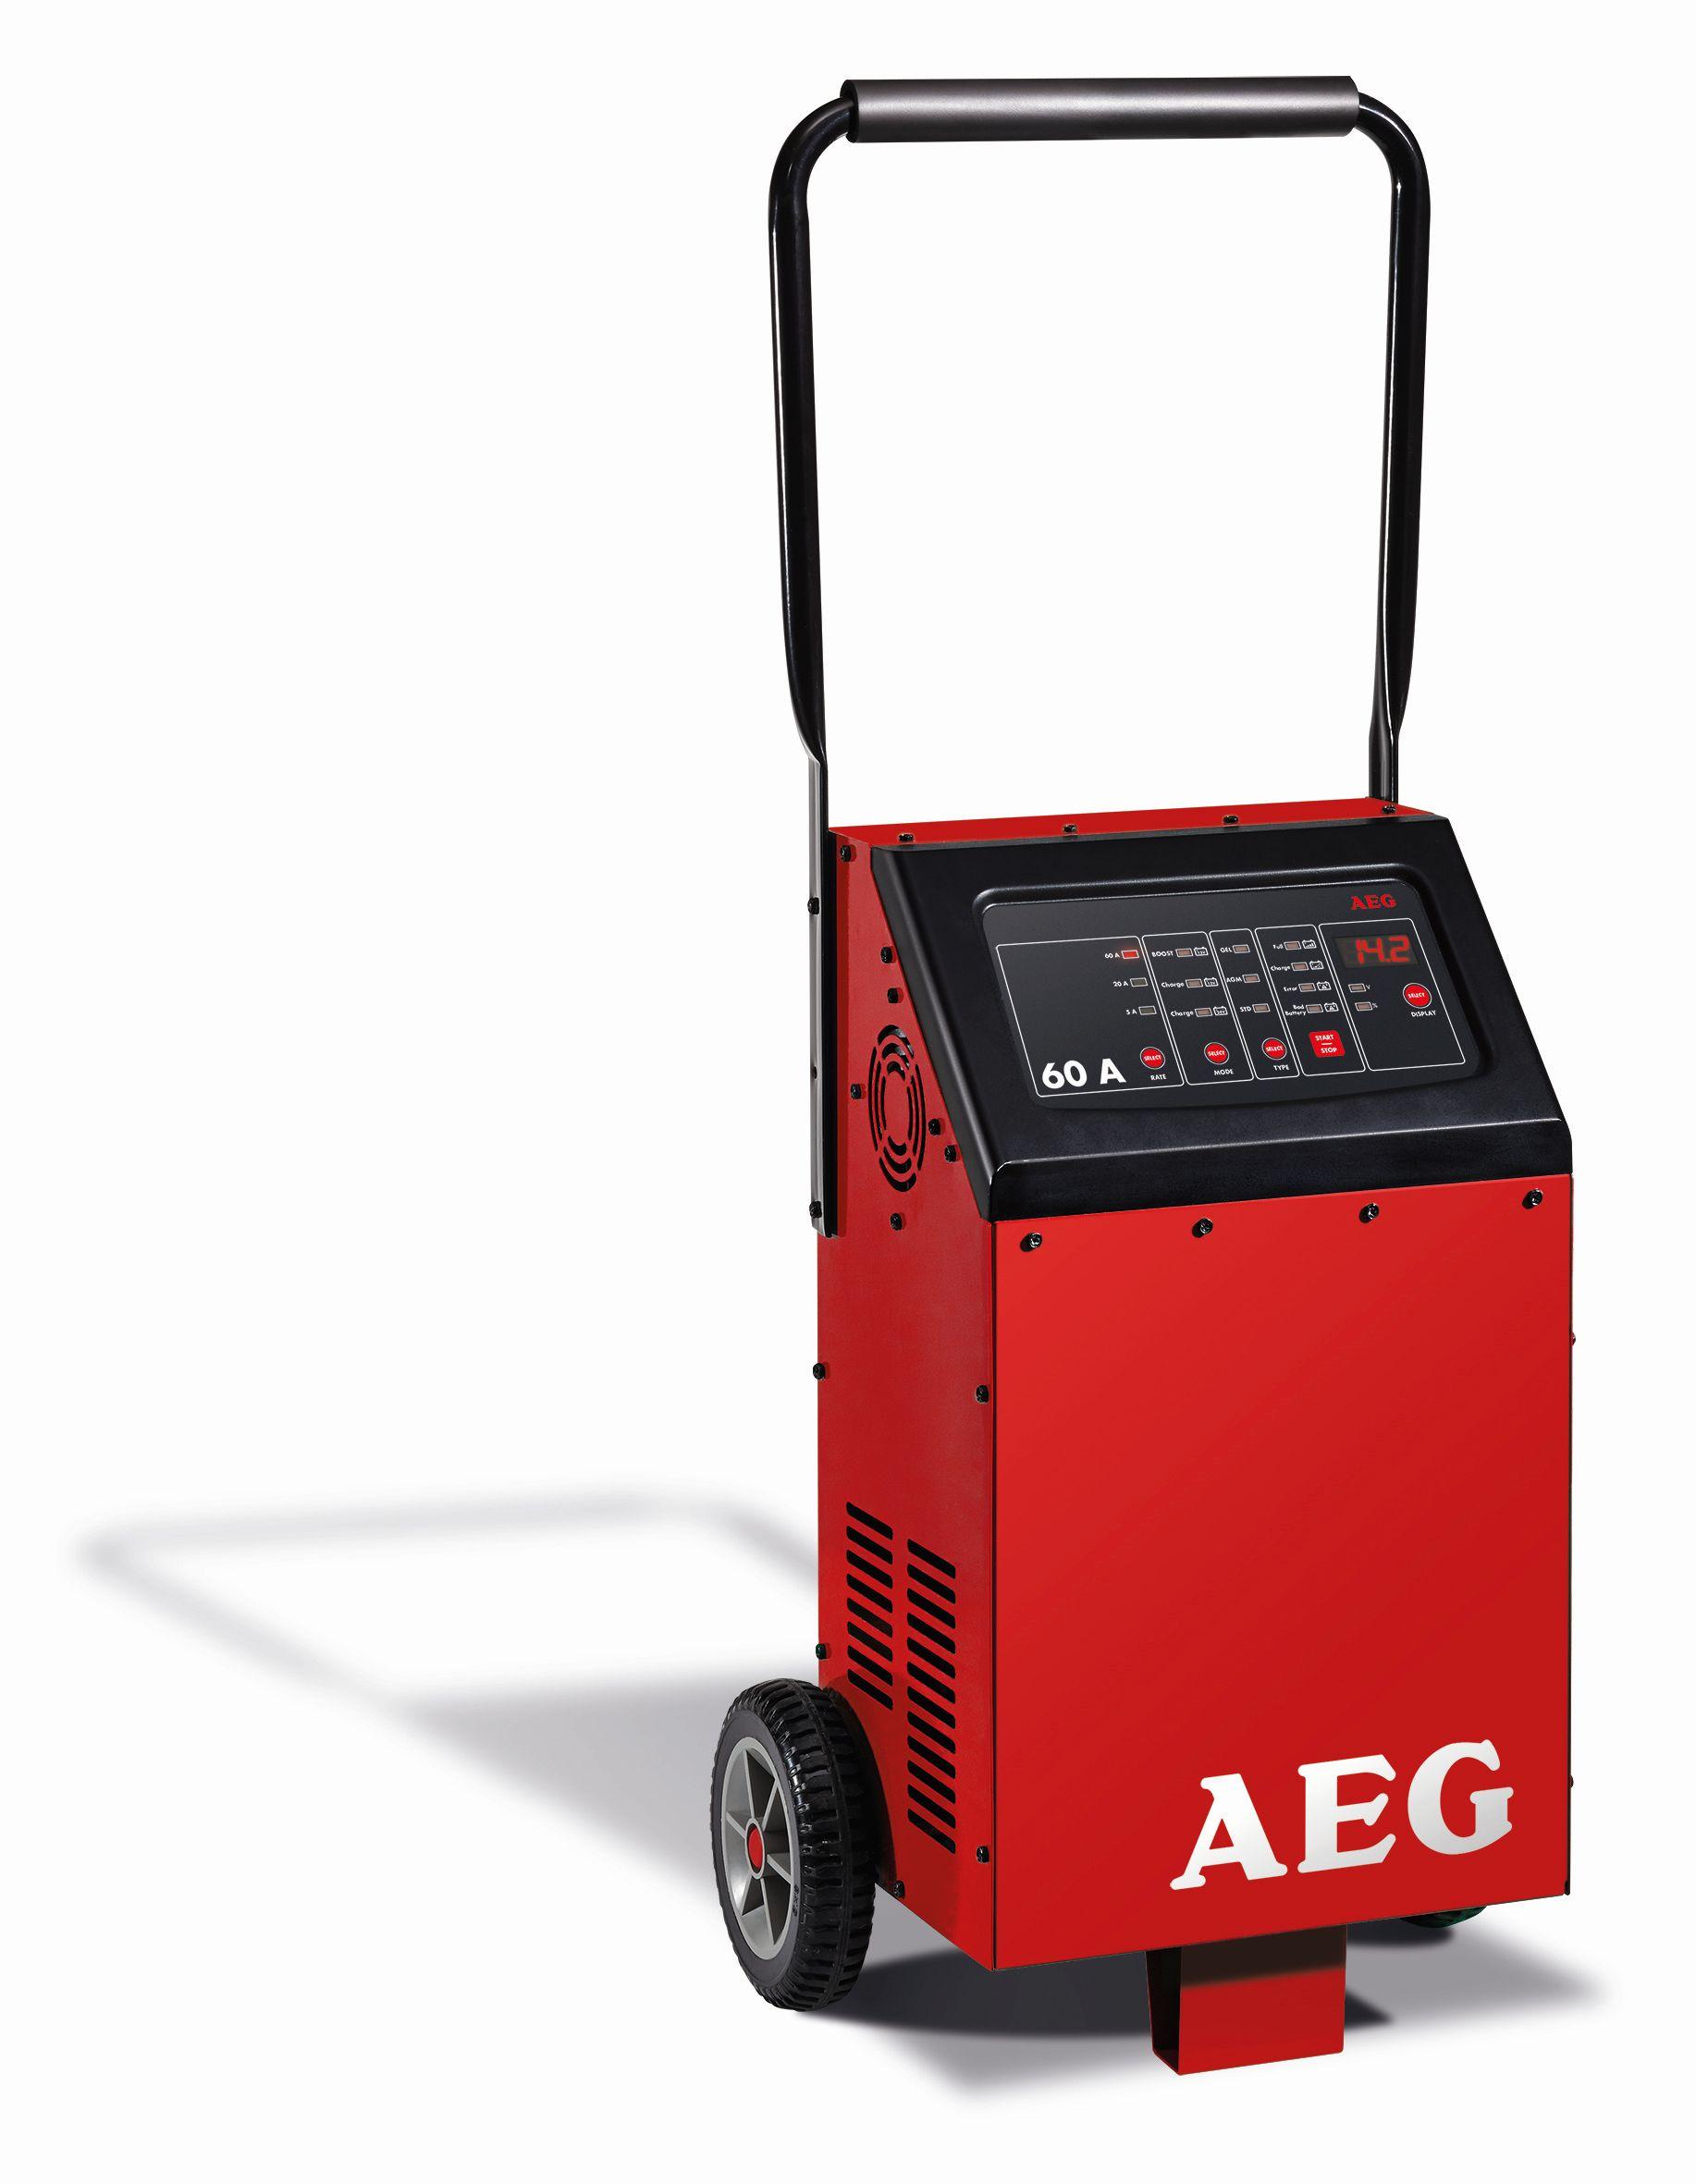 AEG Nabíječka autobaterií s mikroprocesorem AEG 60A 12-24V